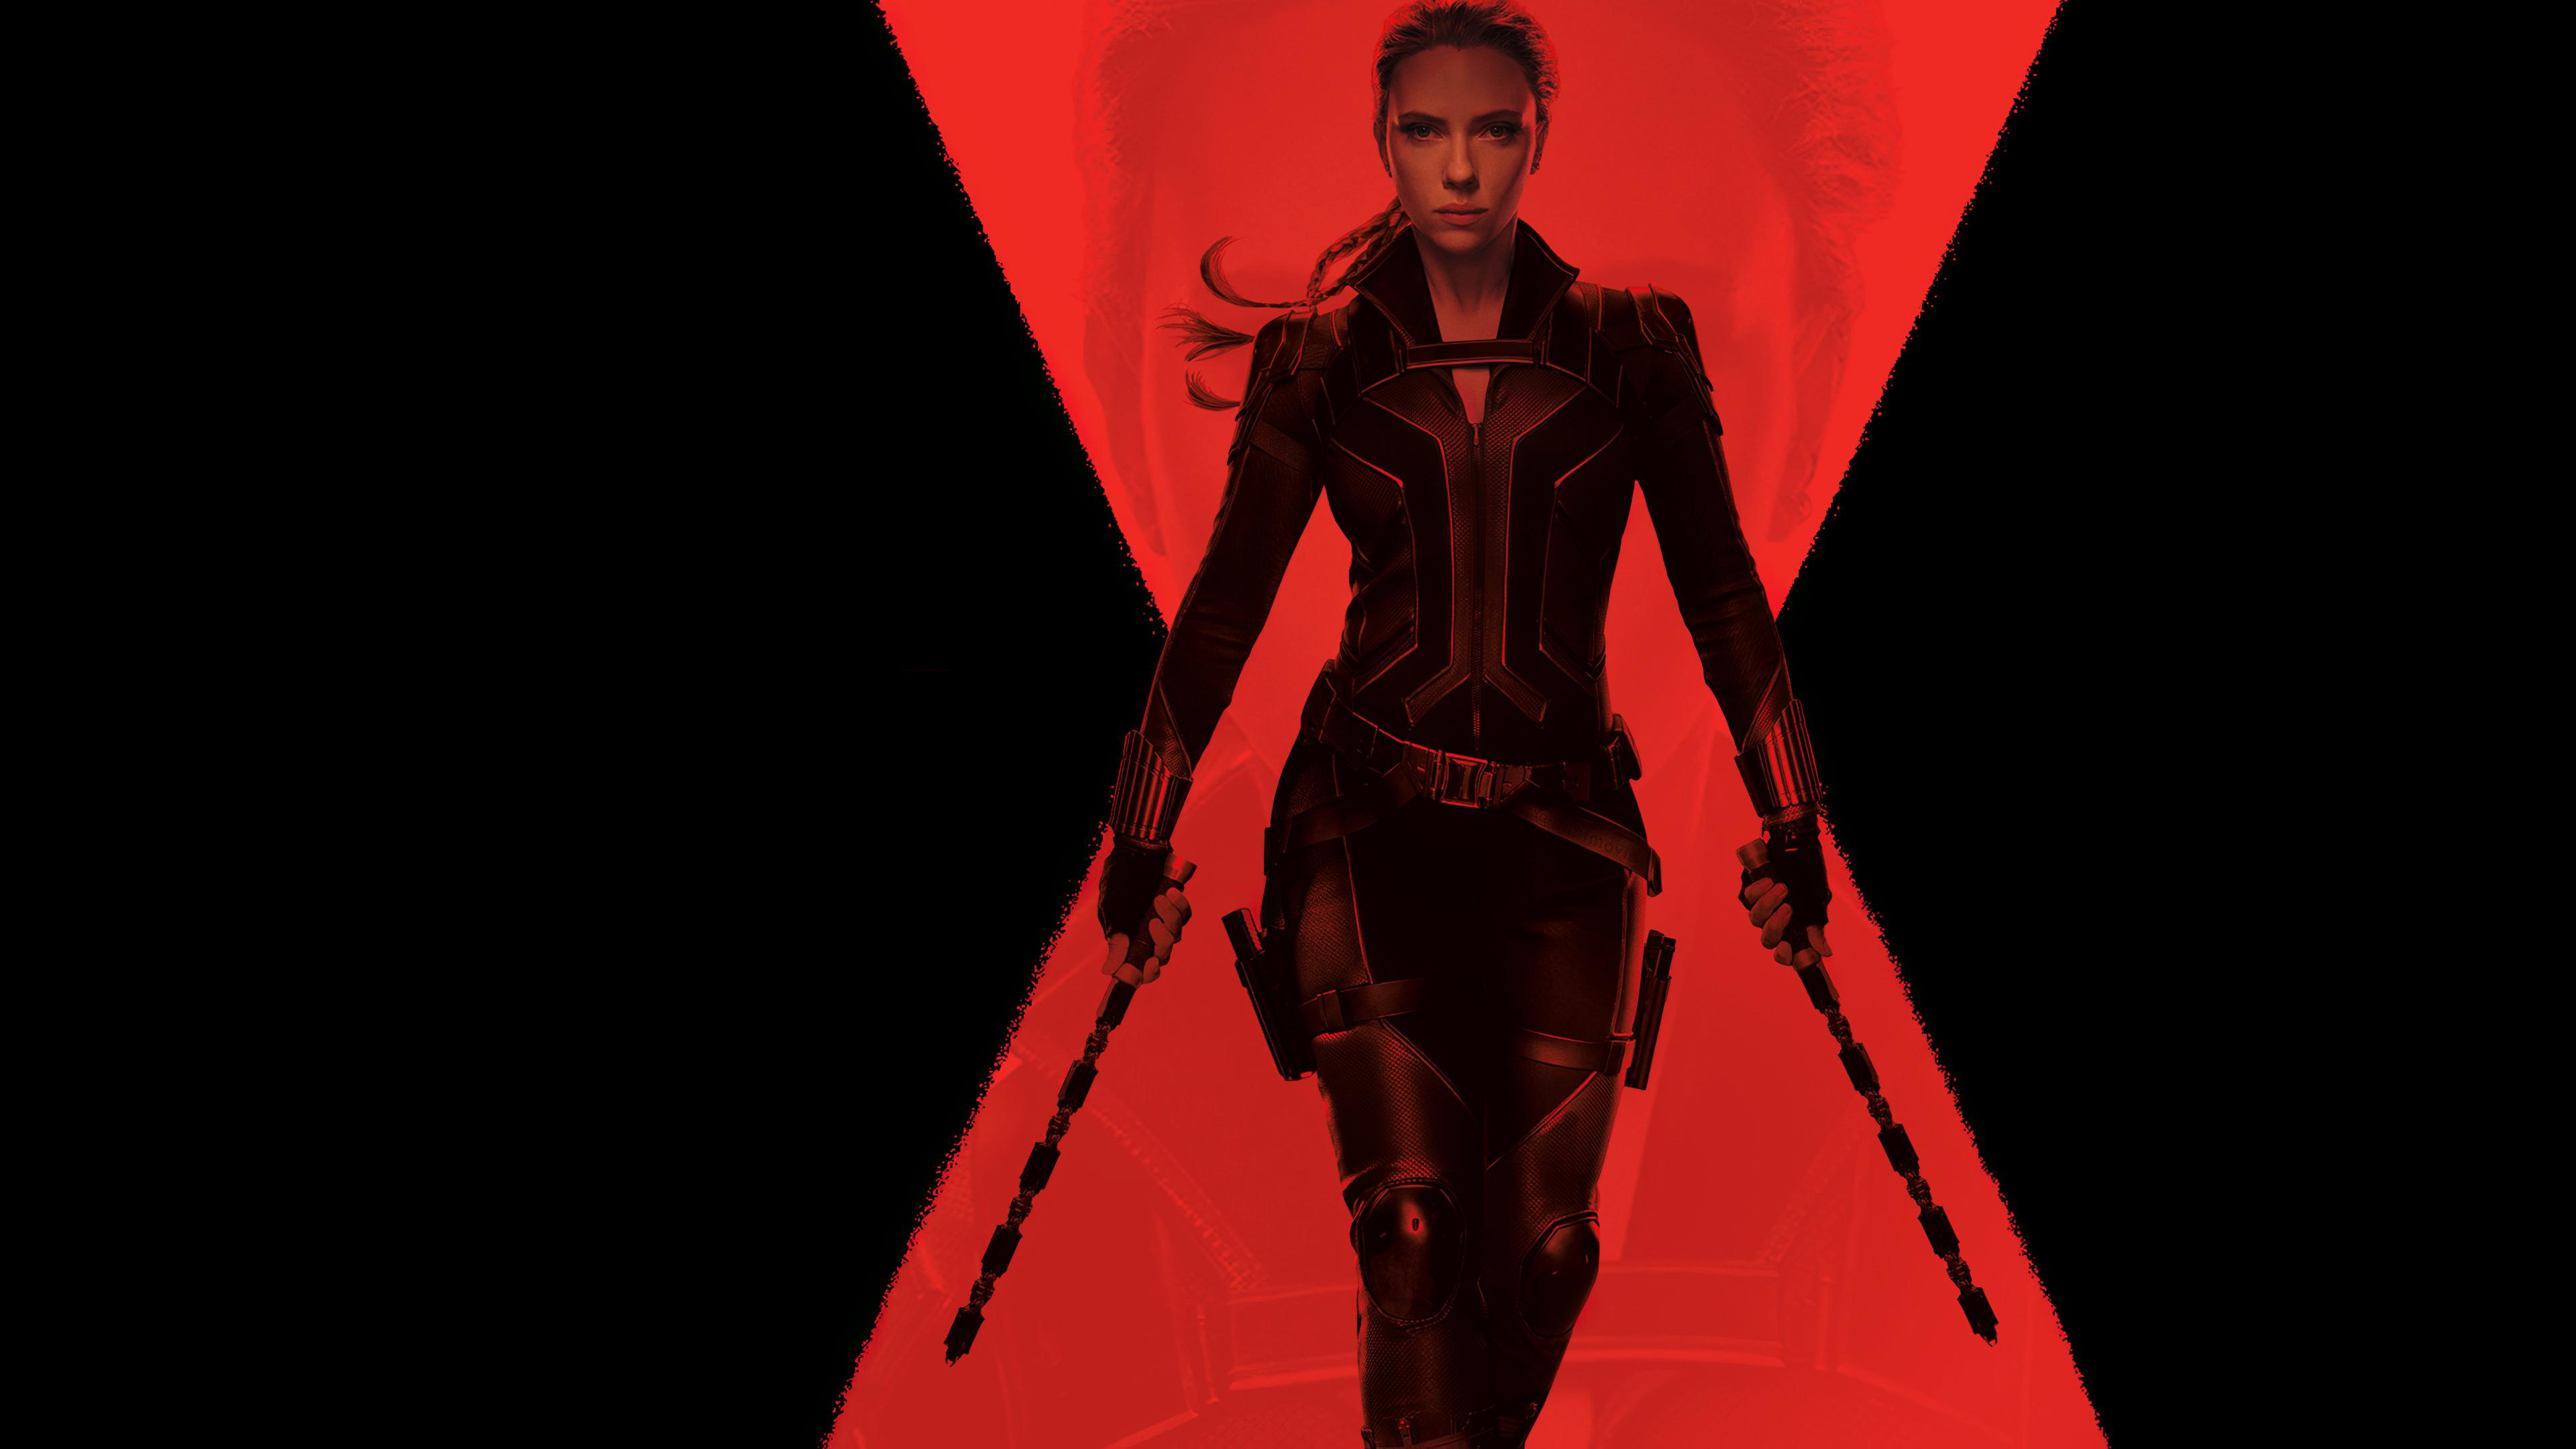 black widow 2020 movie 1579648543 - Black Widow 2020 Movie - Black Widow 2020 movie wallpapers 4k